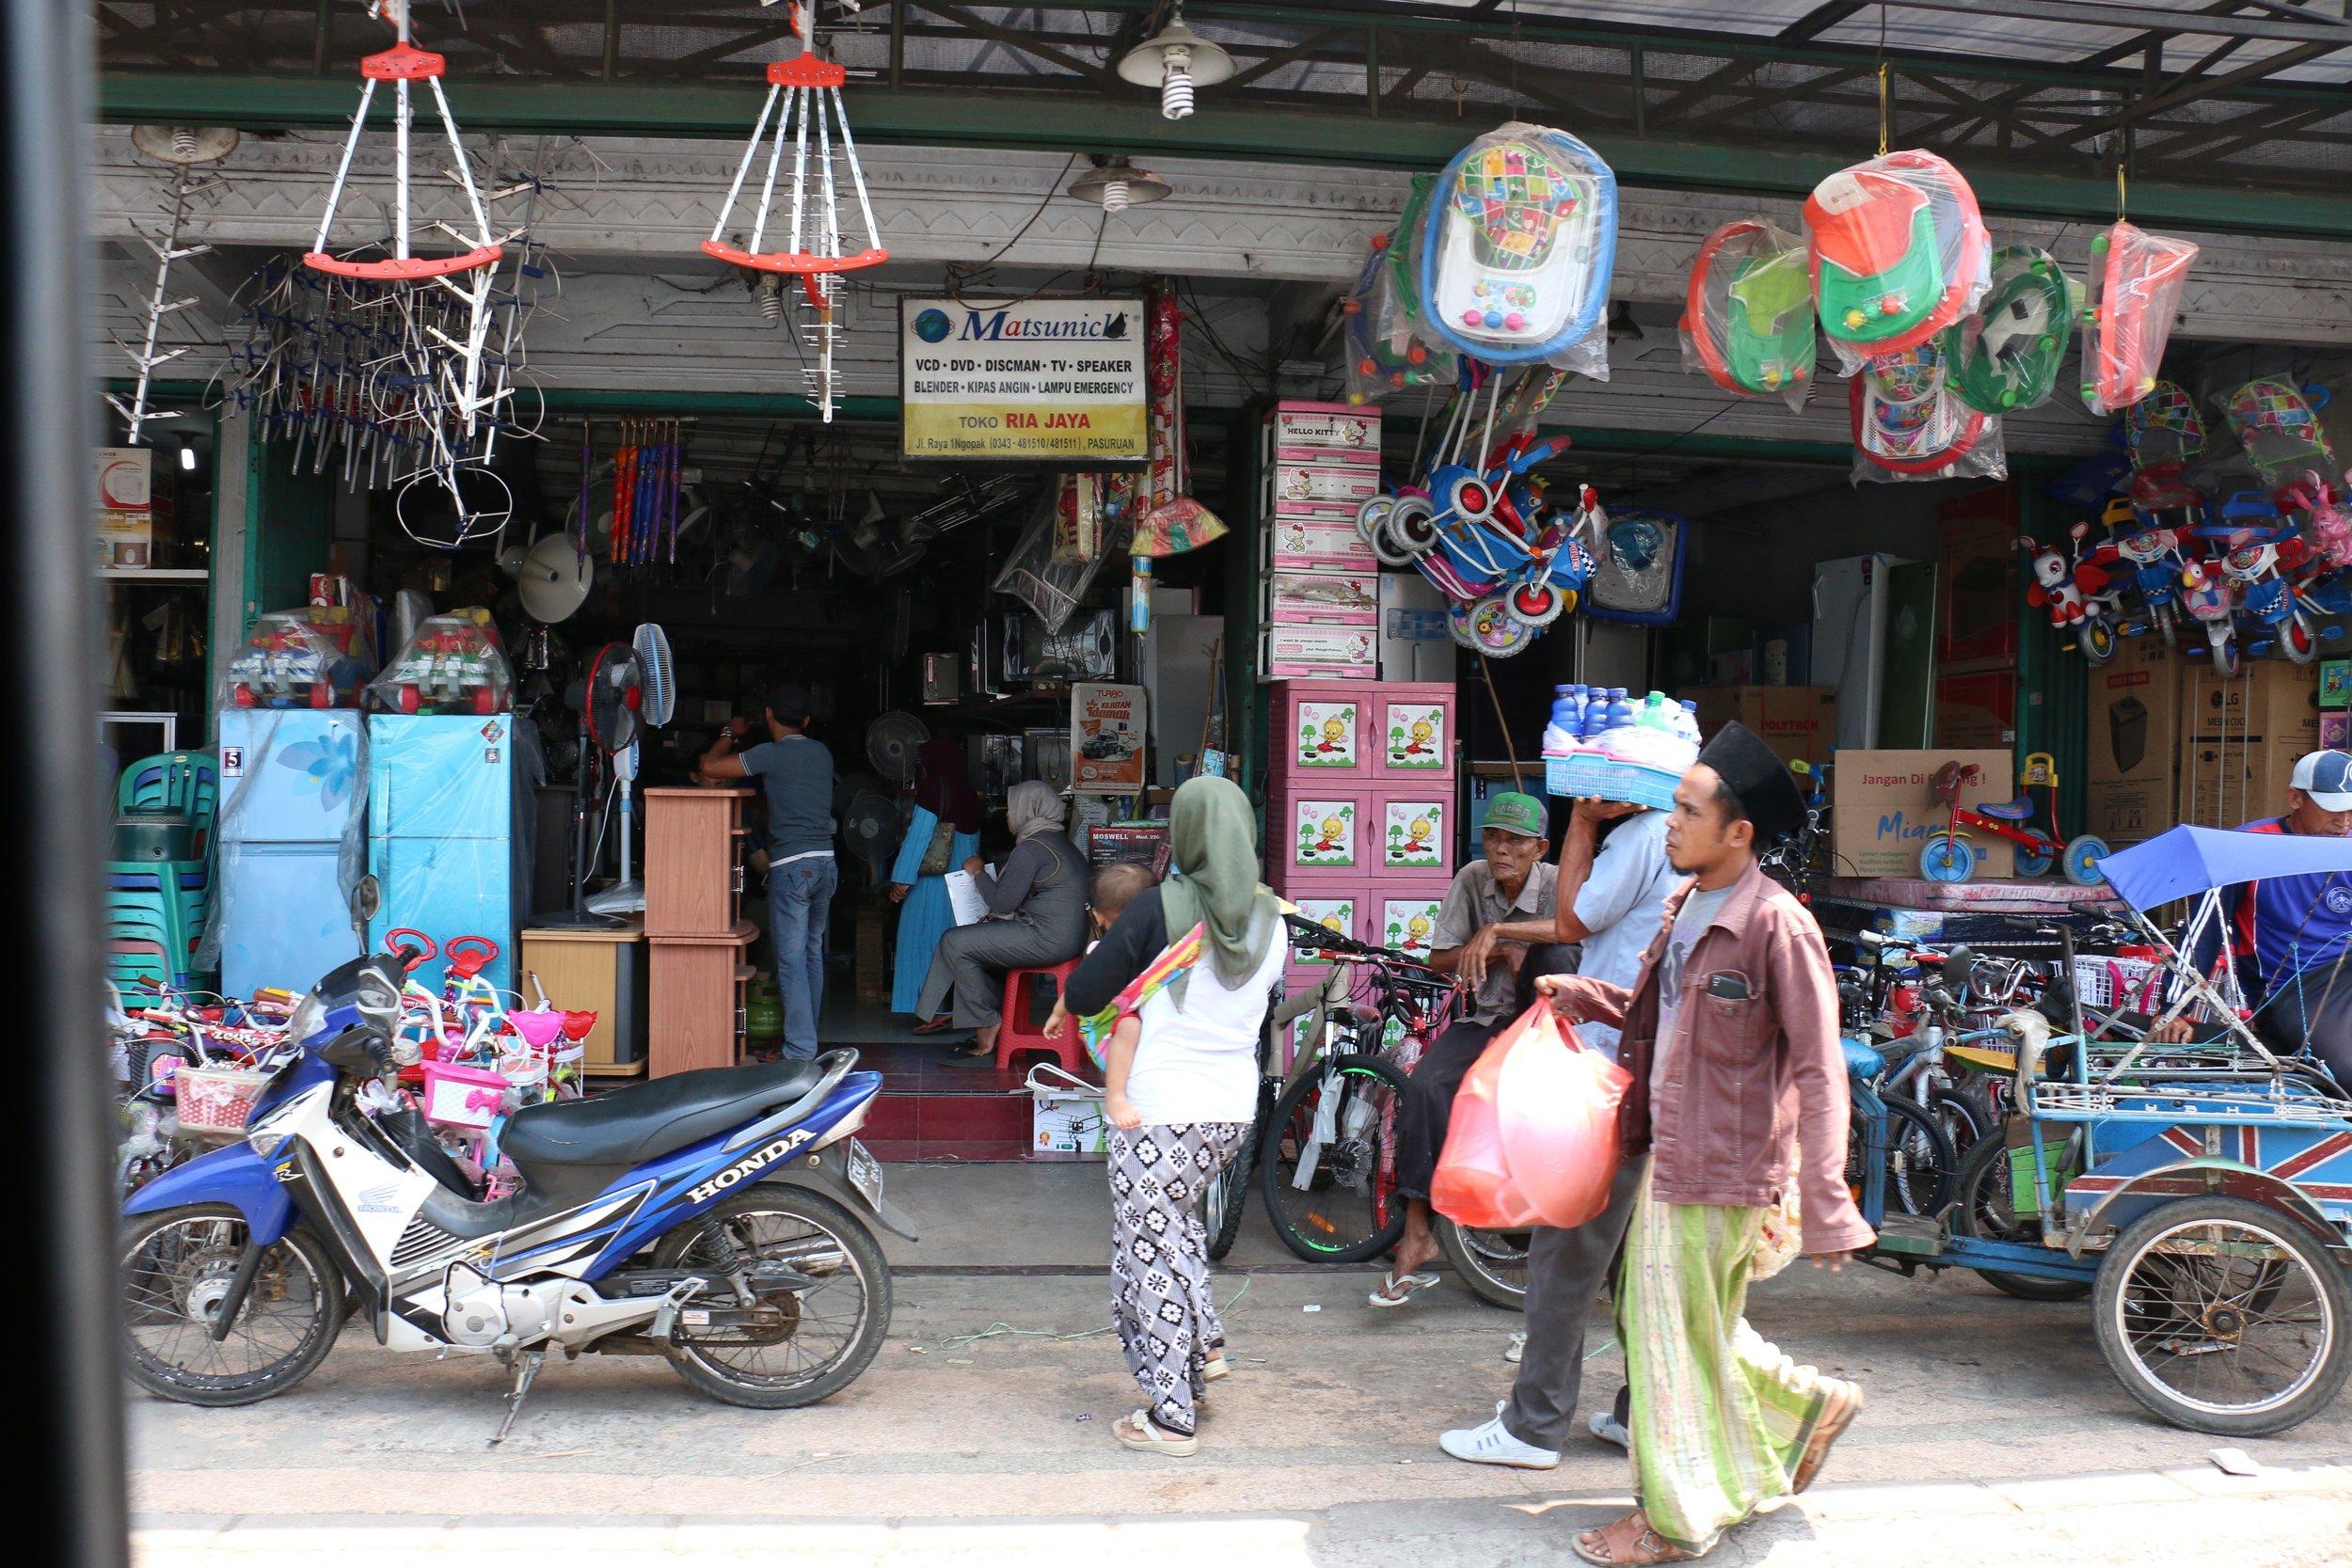 Shop front in Probolingo